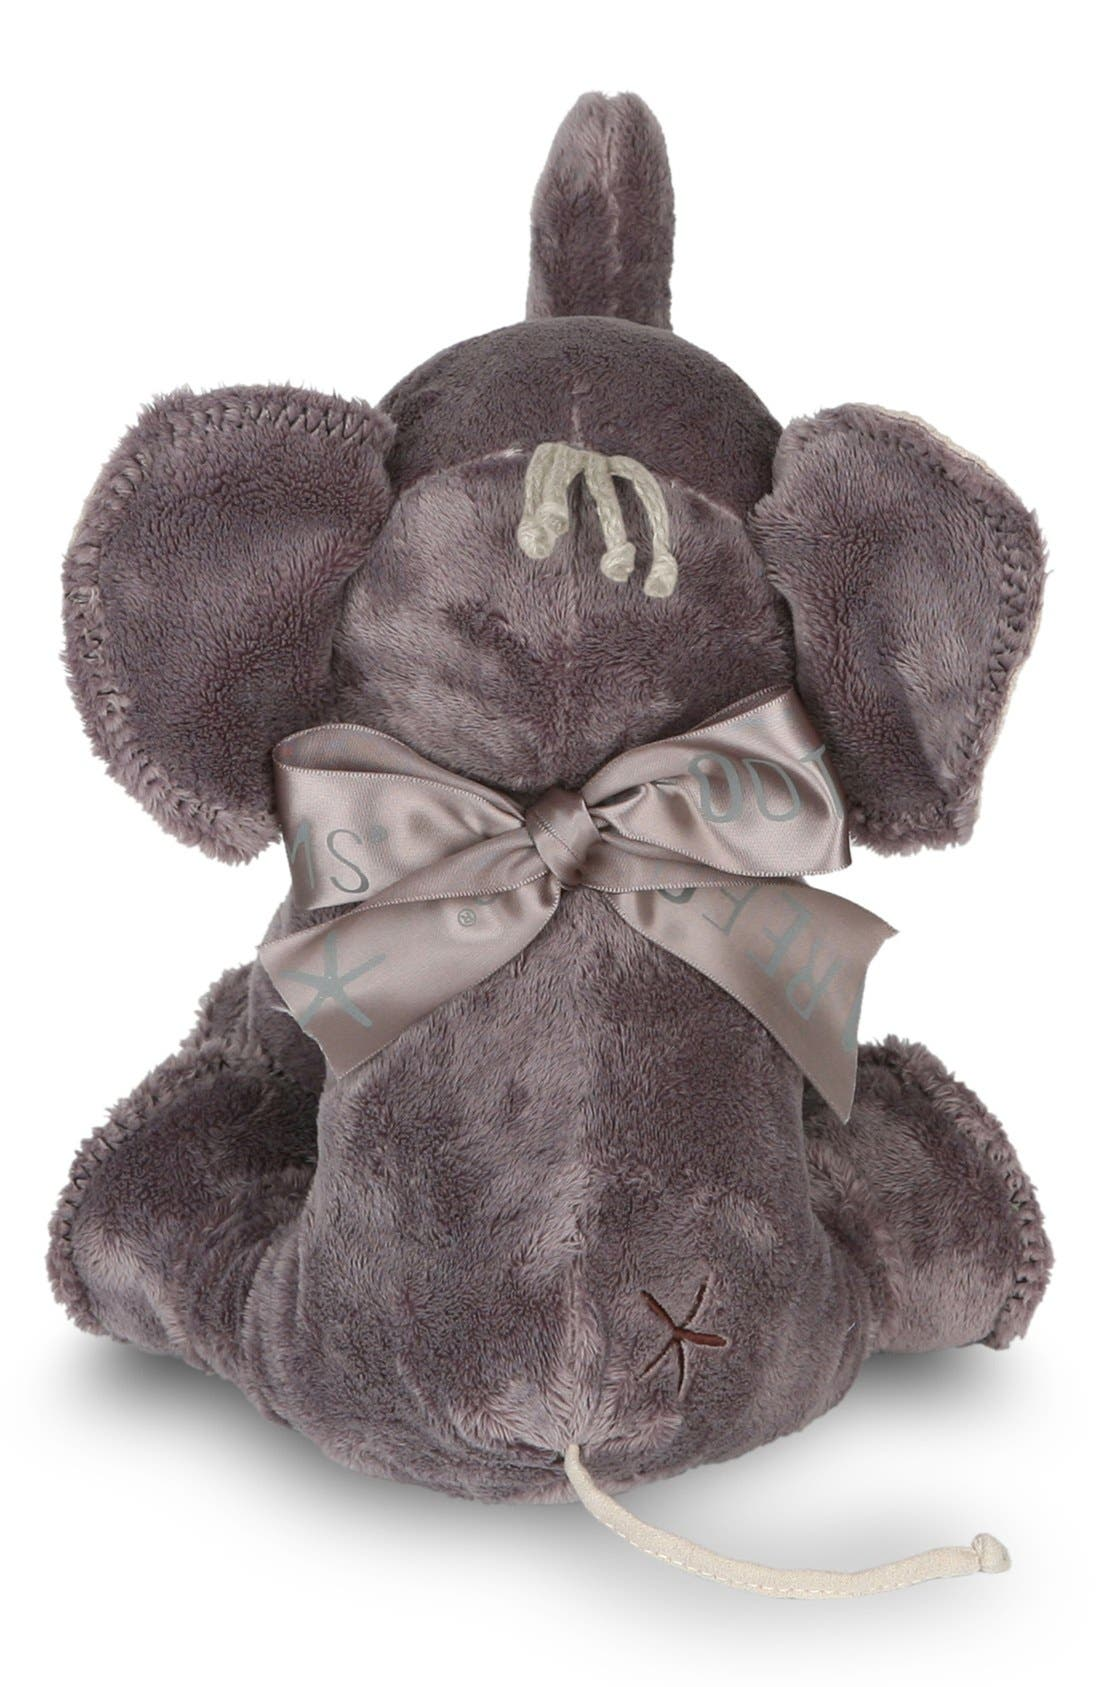 'Buddy the Elephant' Stuffed Animal,                             Alternate thumbnail 3, color,                             Warm Gray